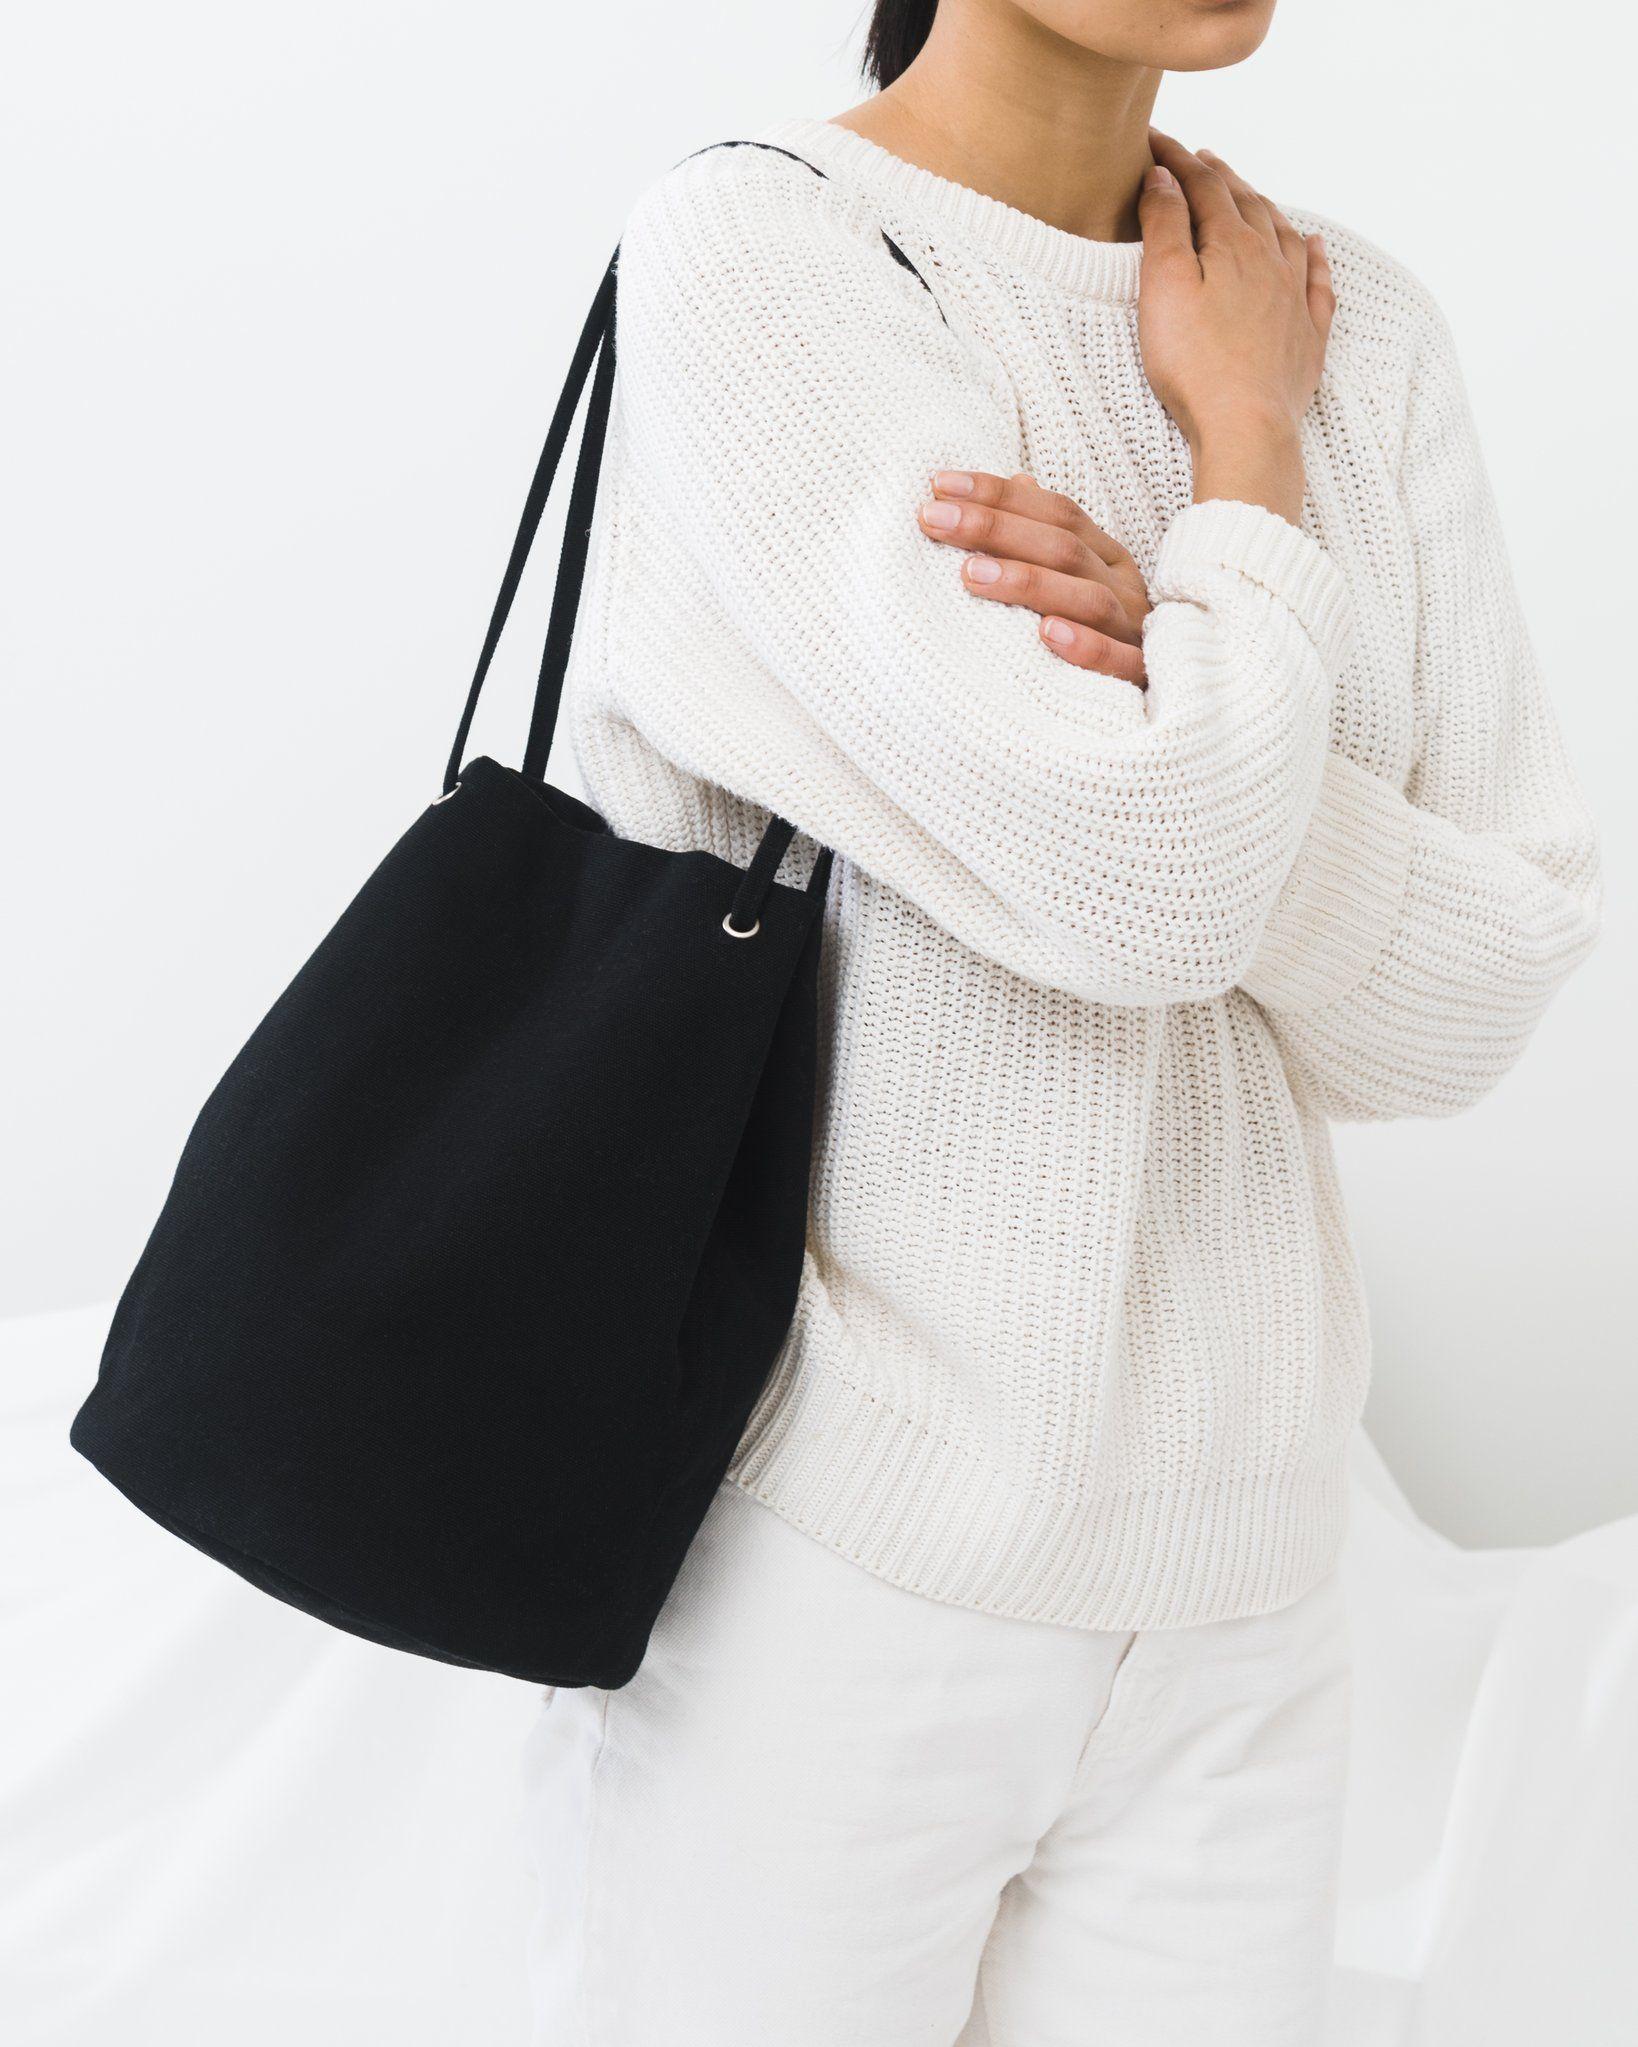 Canvas Bucket Bag Black Bucket bag, Fashion, Fashion